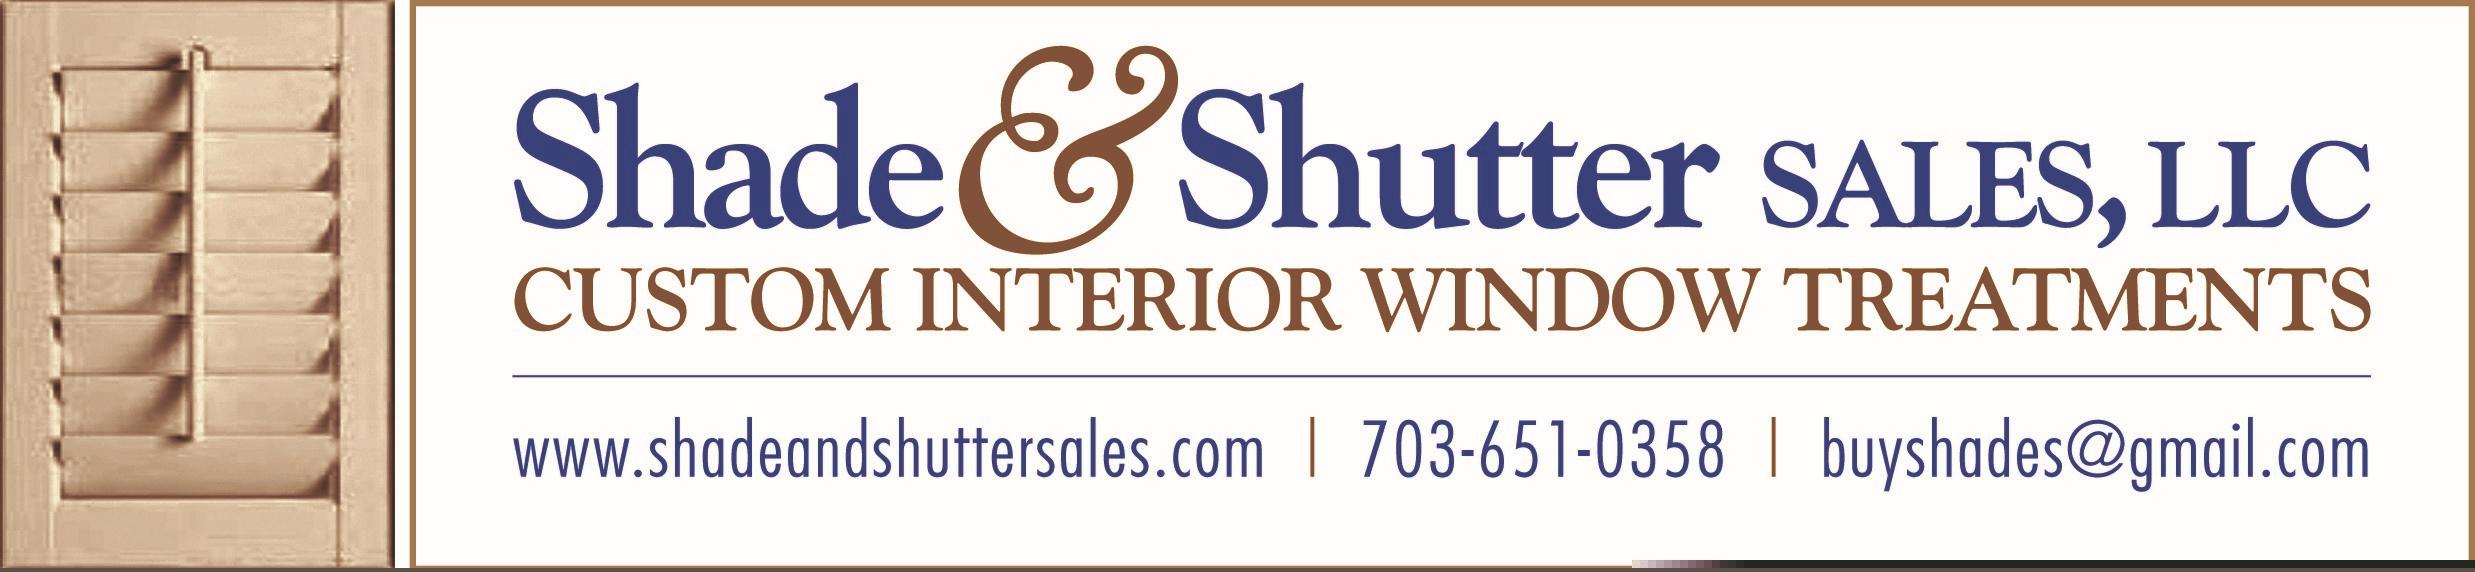 Shade & Shutter Sales LLC